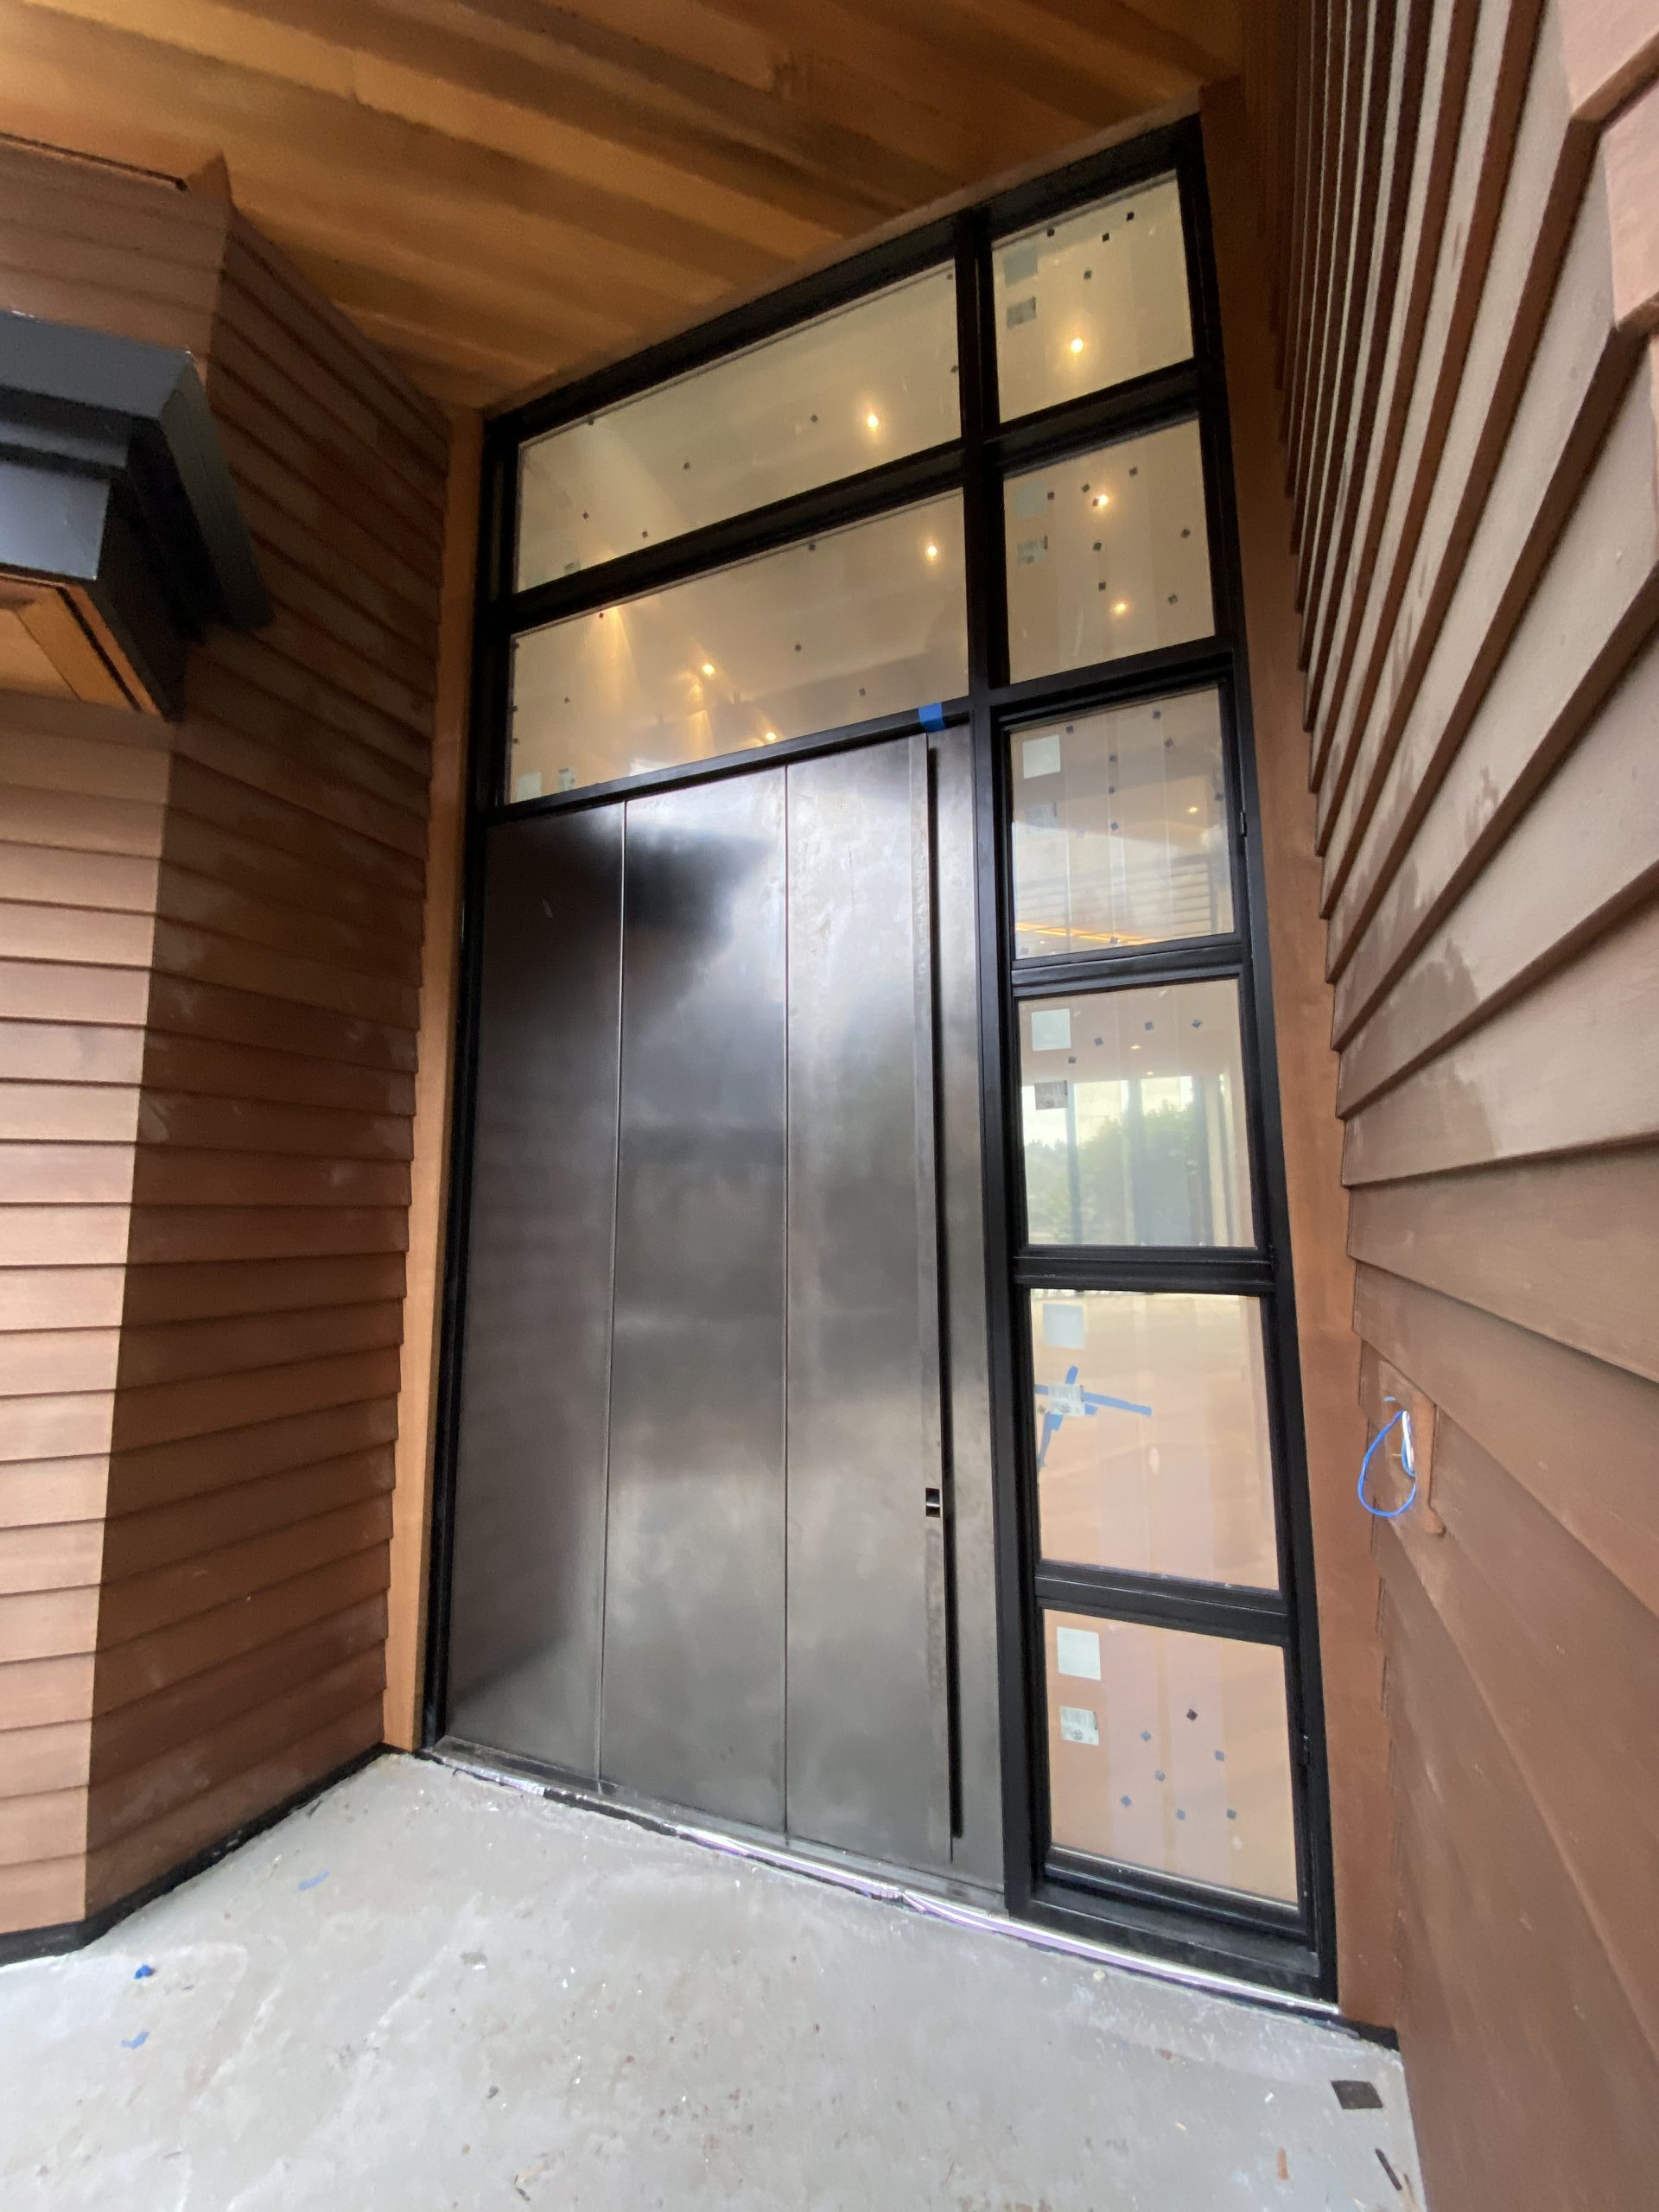 mw design workshop custom entry door cladded